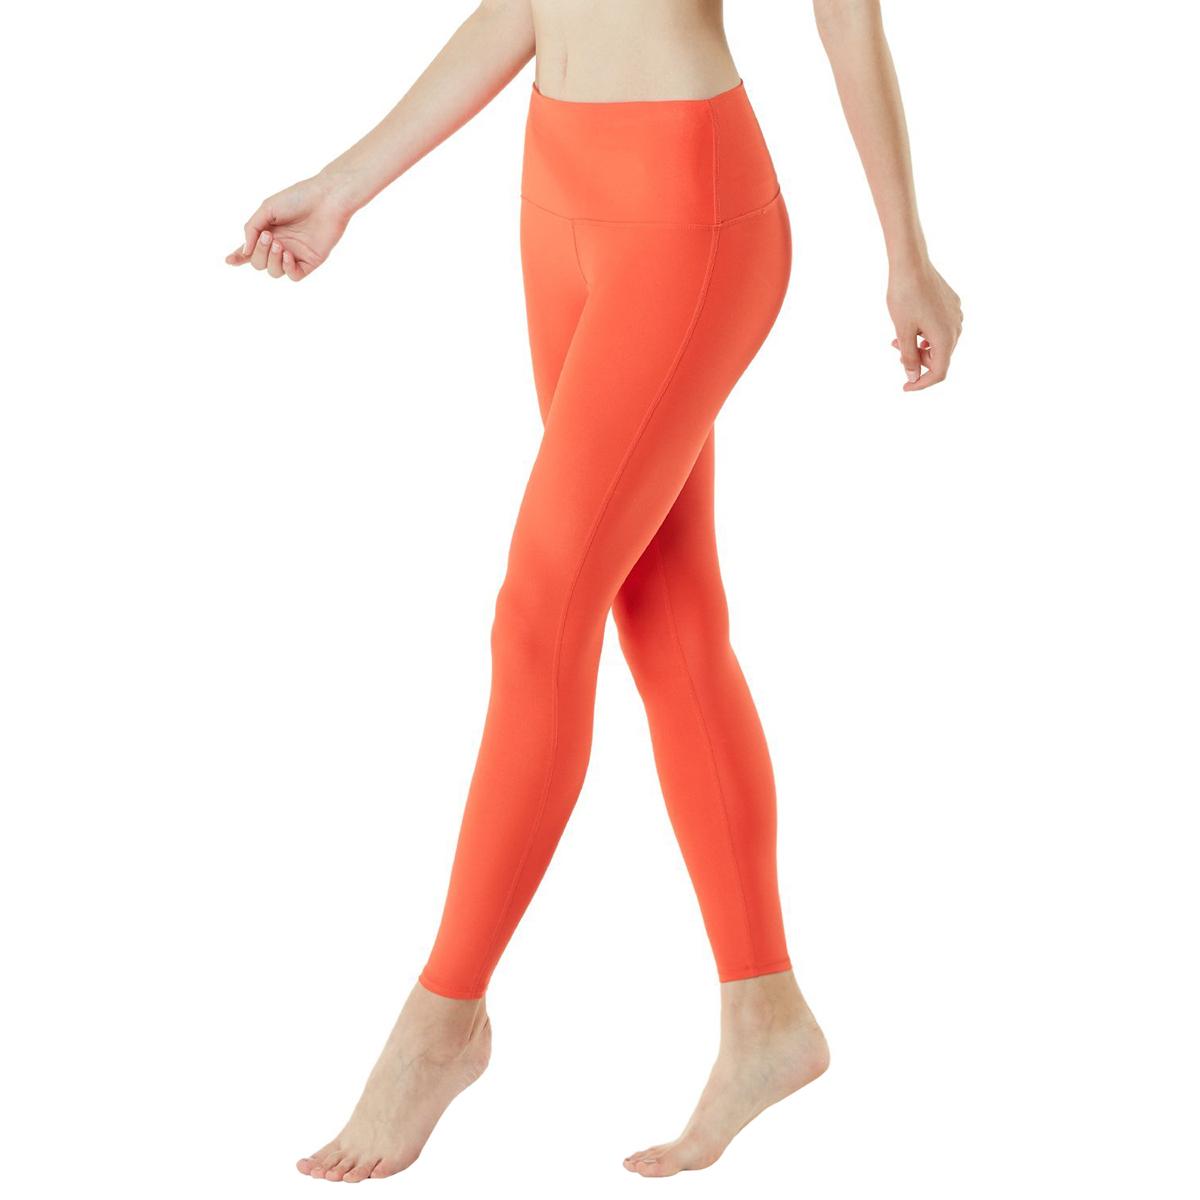 thumbnail 58 - TSLA Tesla FYP42 Women's High-Waisted Ultra-Stretch Tummy Control Yoga Pants